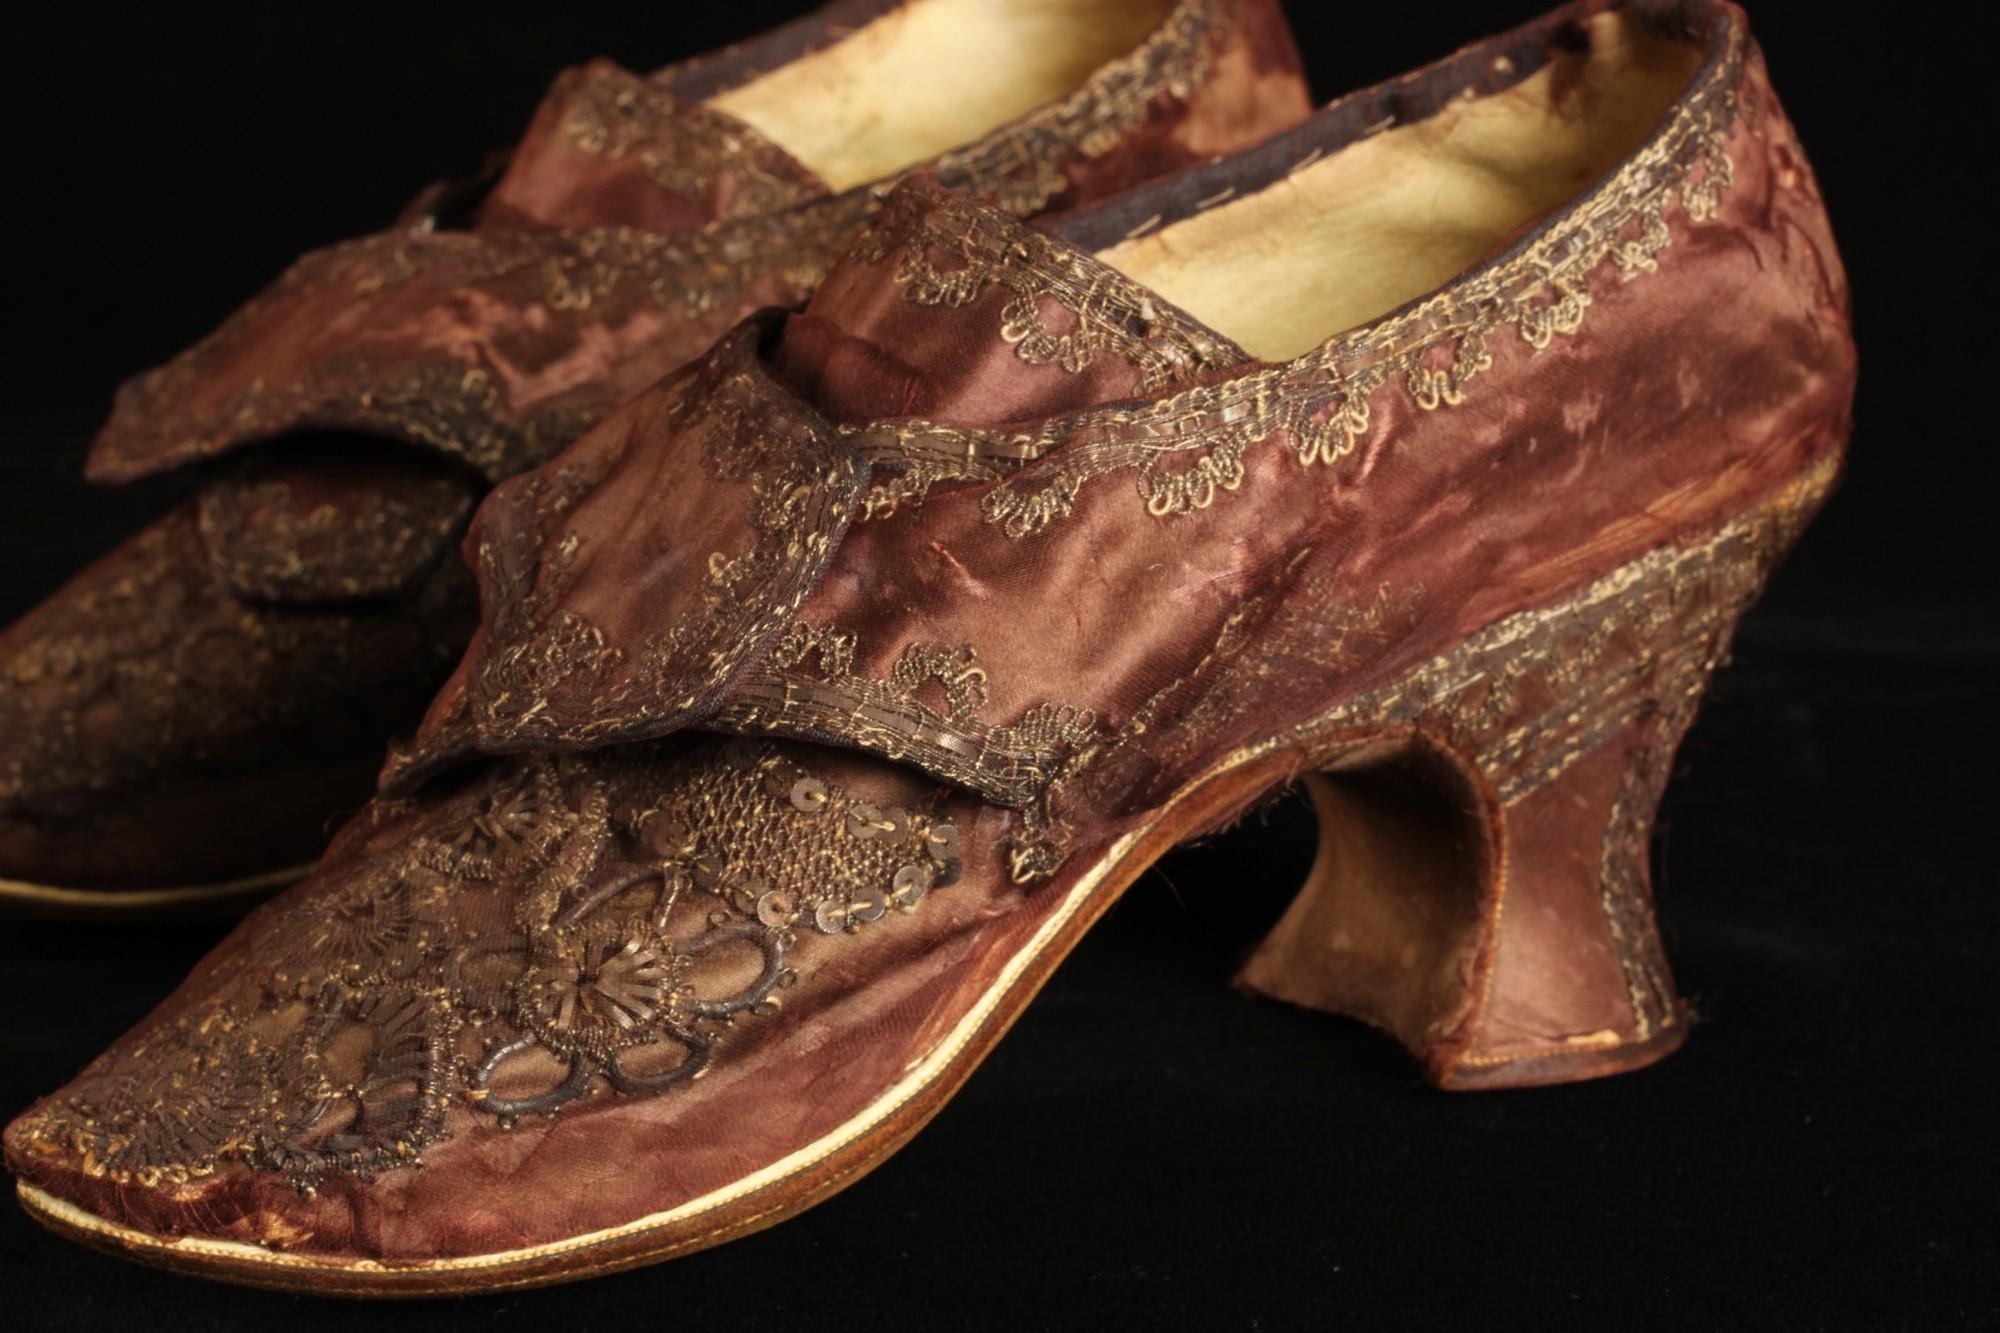 dd778defa3c7 Shoe Shopping · George Washington s Mount Vernon